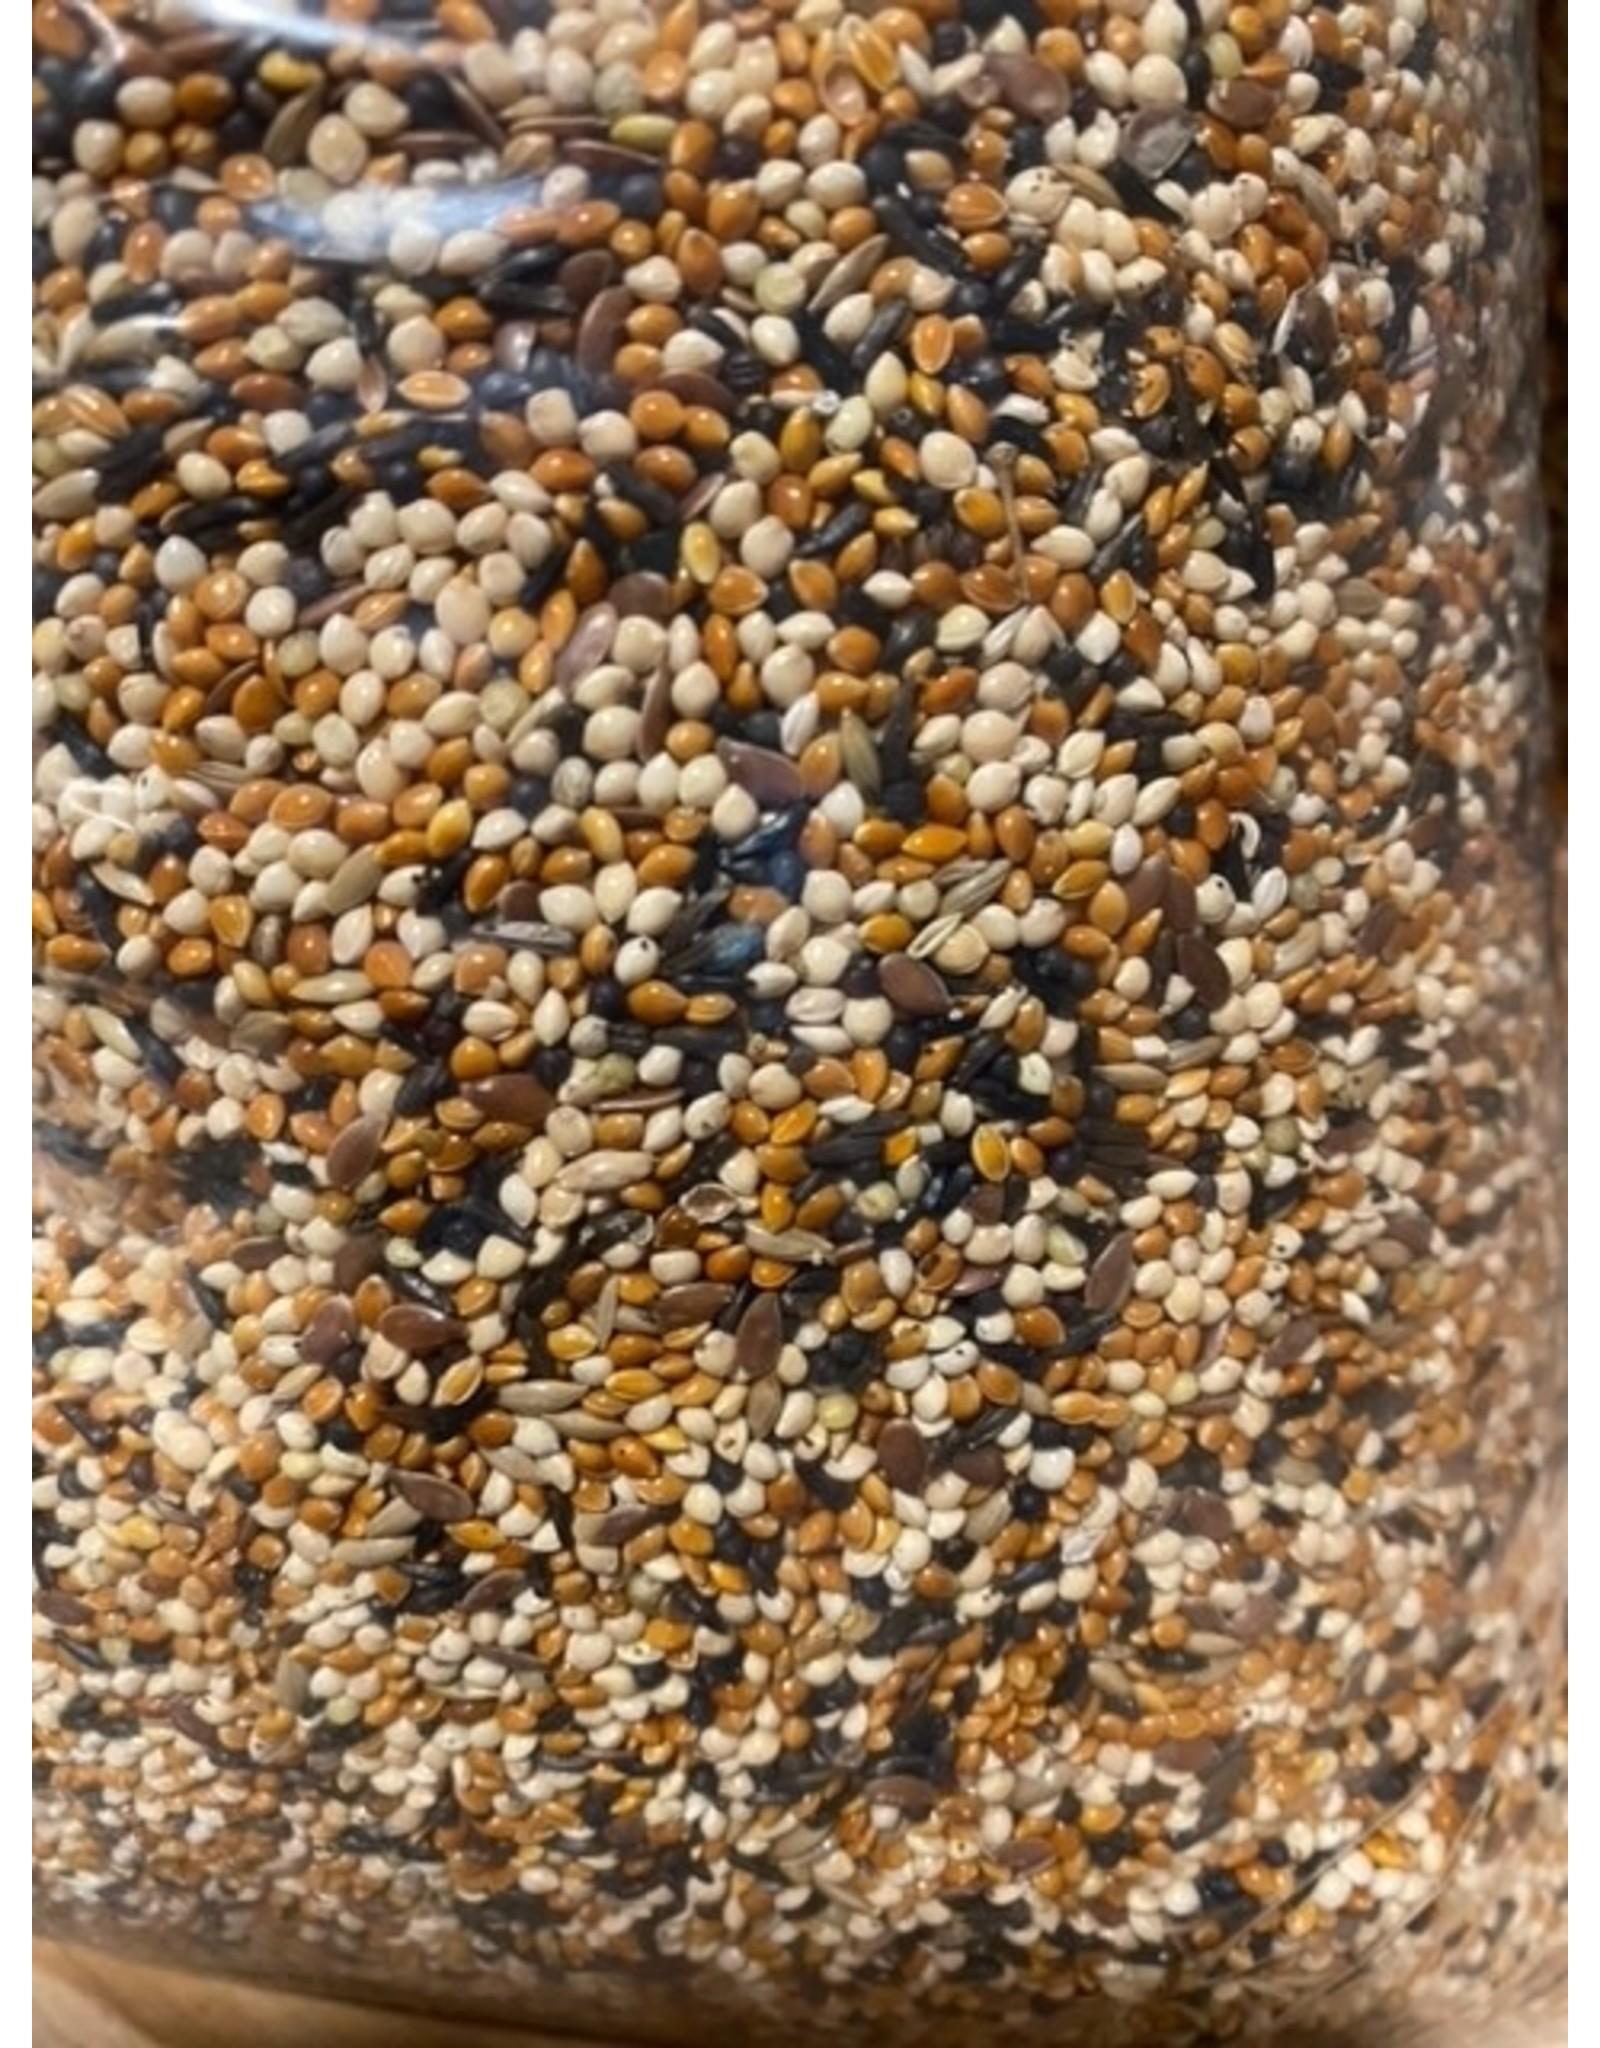 Mill Creek/Seed DISTMX12 distlemix for ground birds 12lb bag